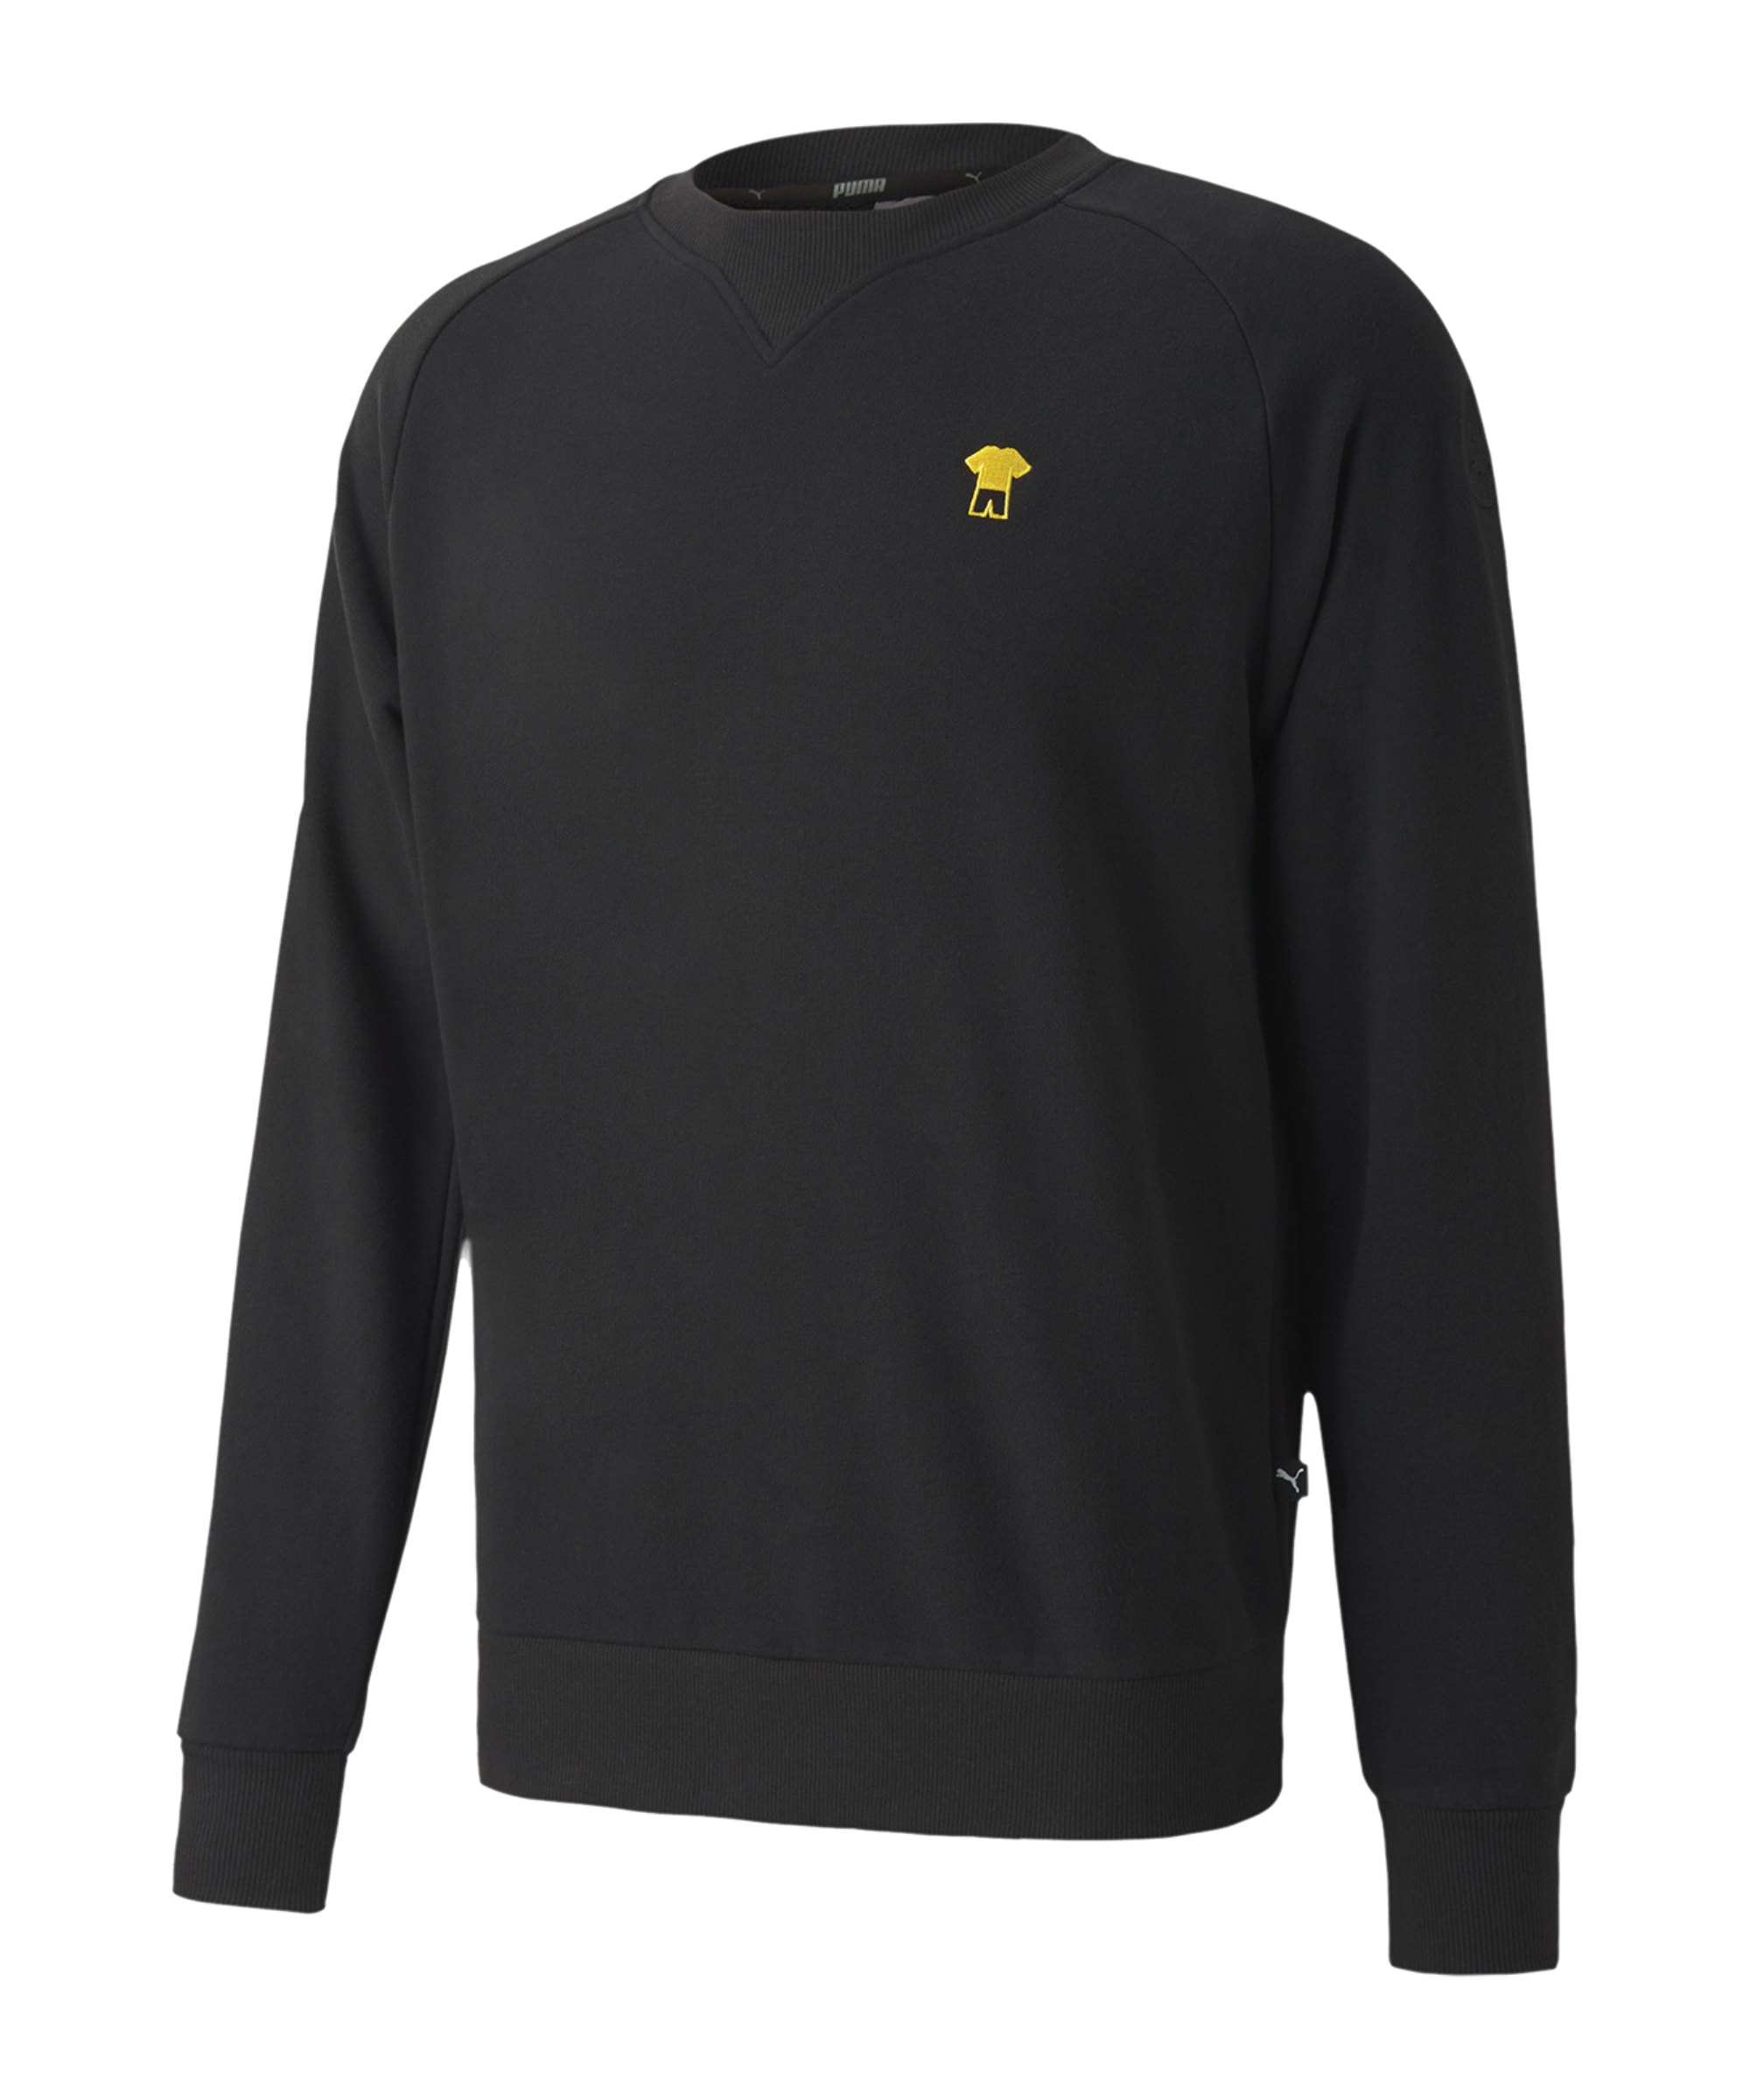 PUMA BVB Dortmund ftblFeat Game Sweatshirt F02 - schwarz